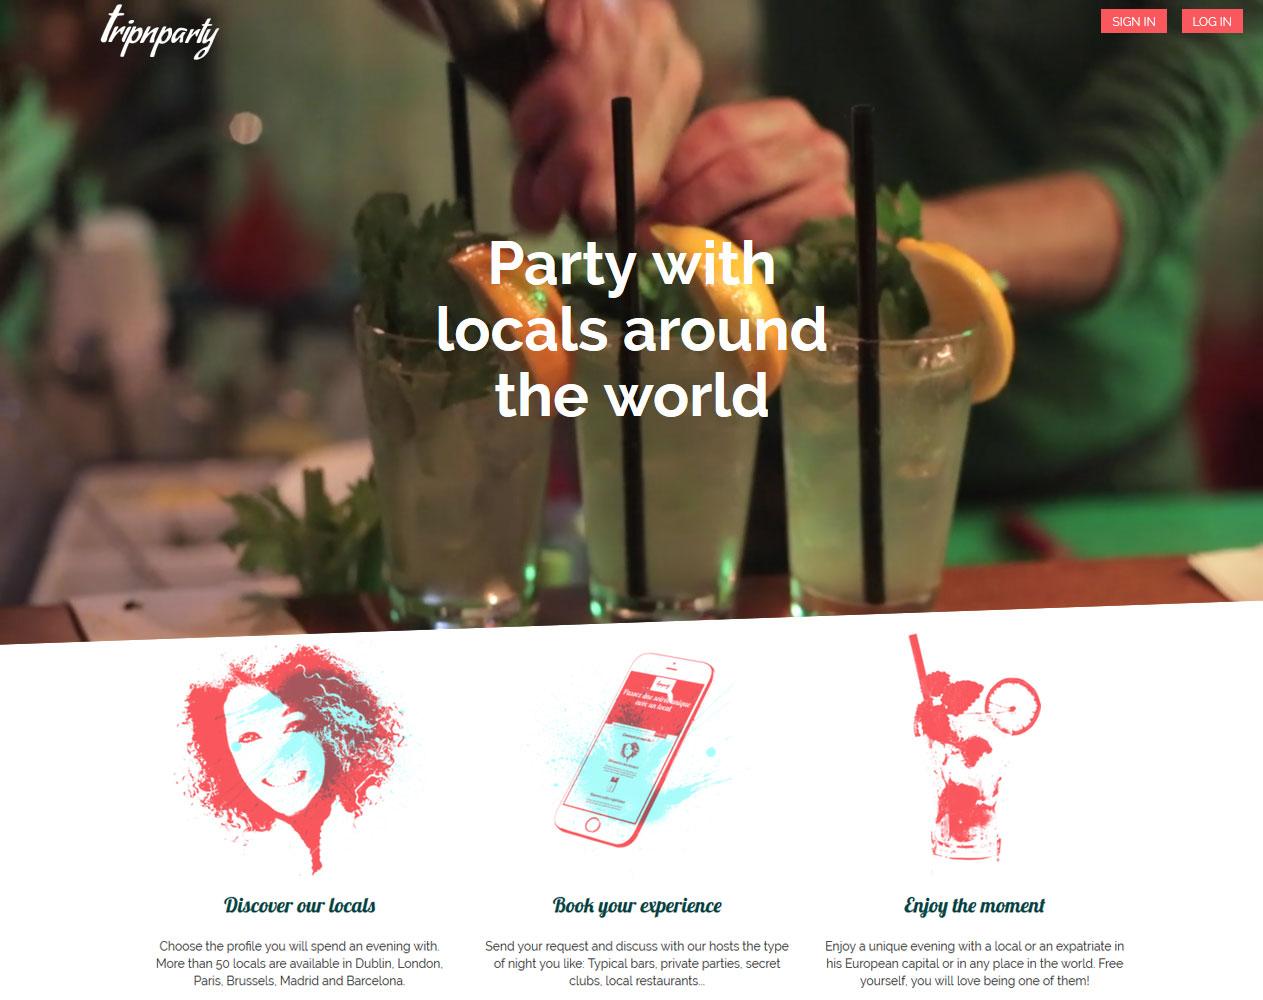 Enhancement of WordPress Based Website: Tripnparty